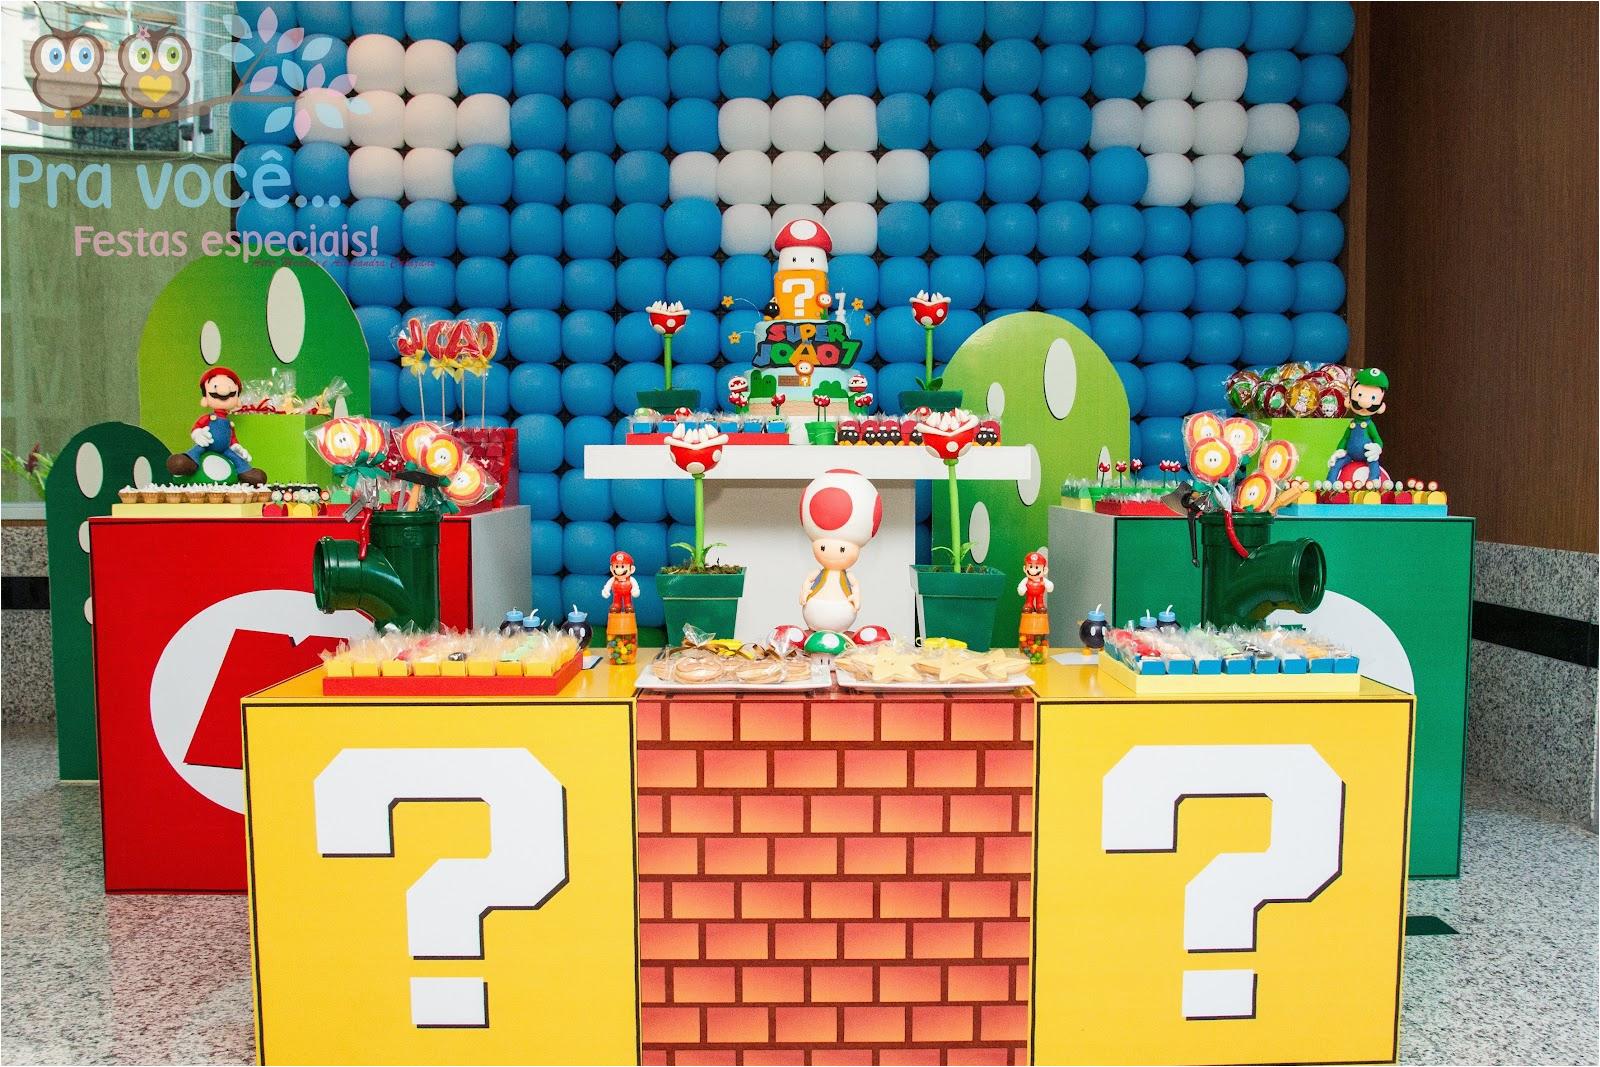 innovative and original childrens party ideas